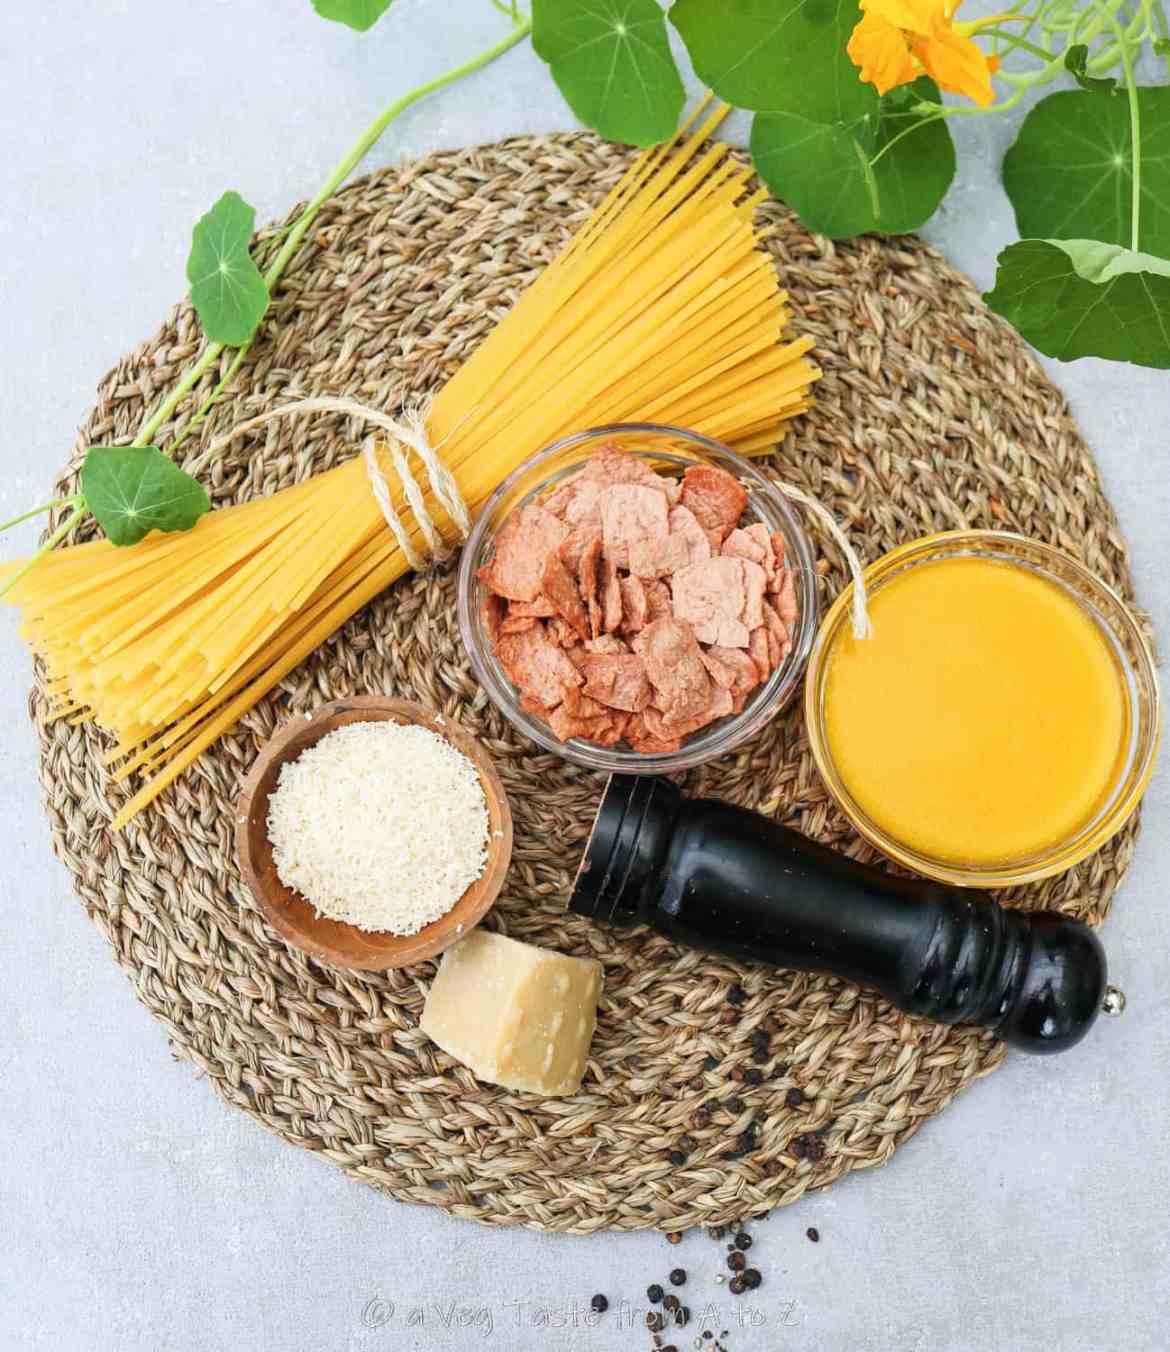 vegan carbonara ingredients